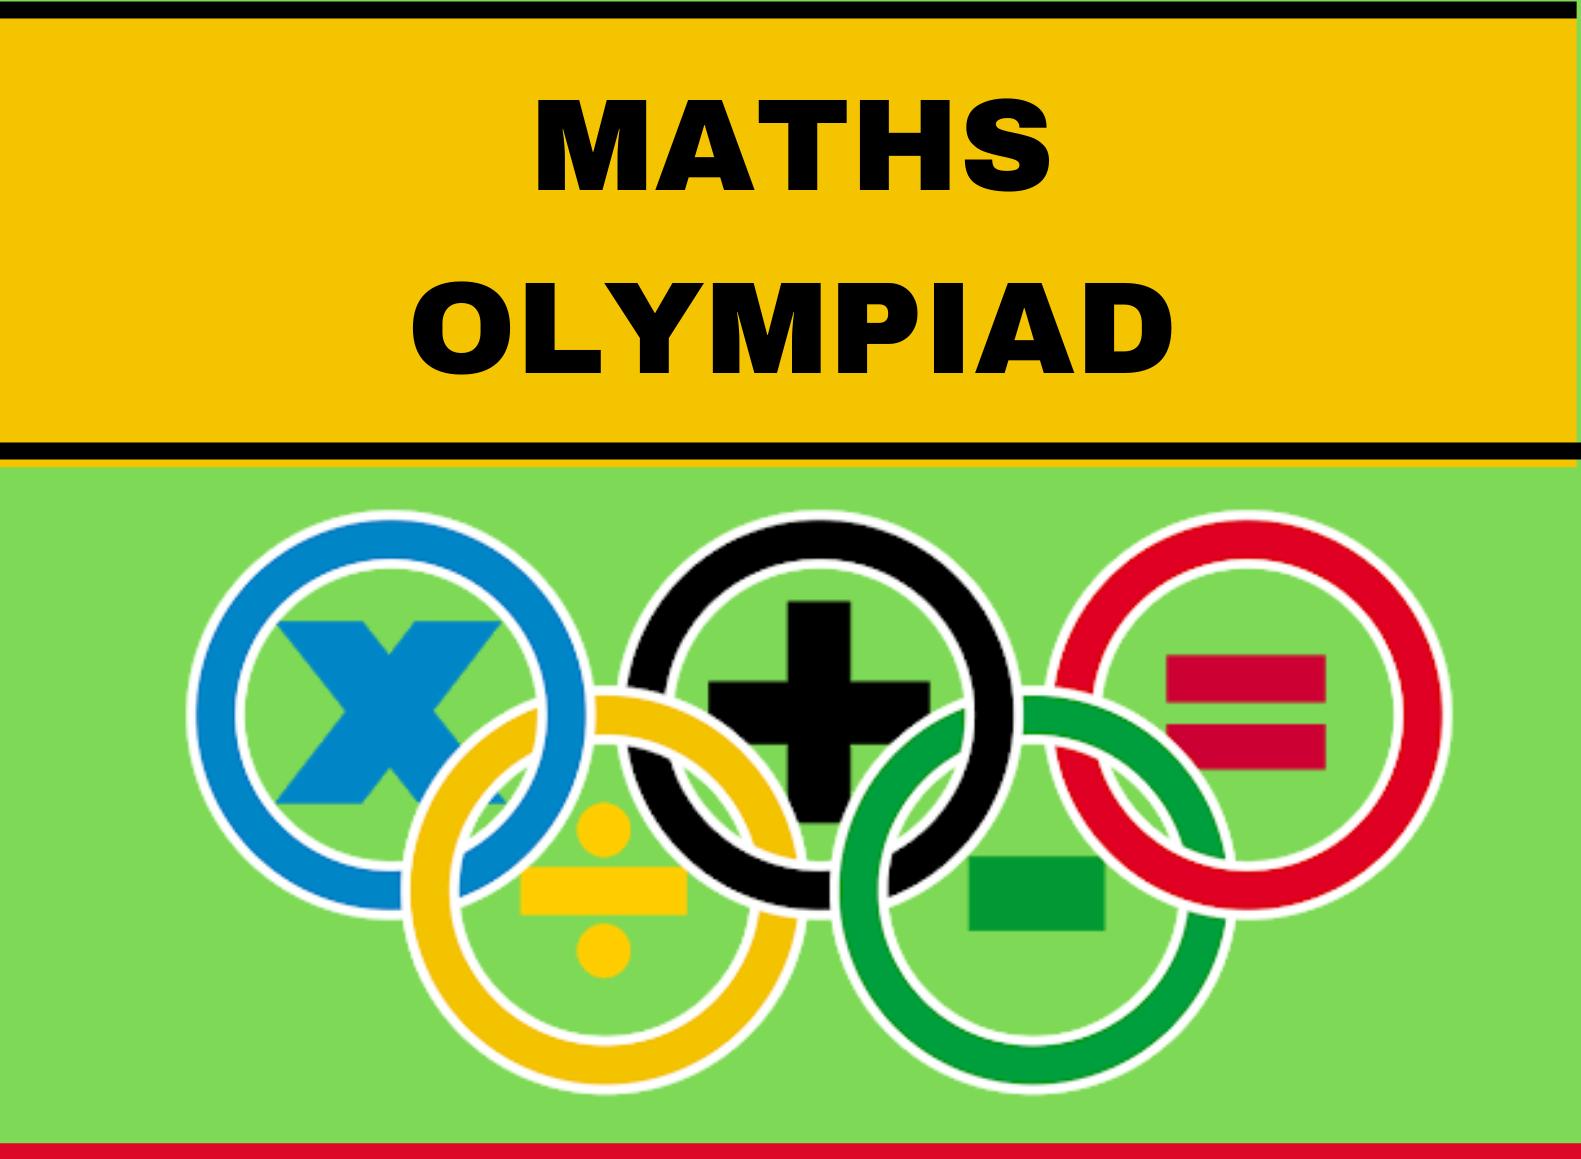 MATHS OLYMPIAD POSTER